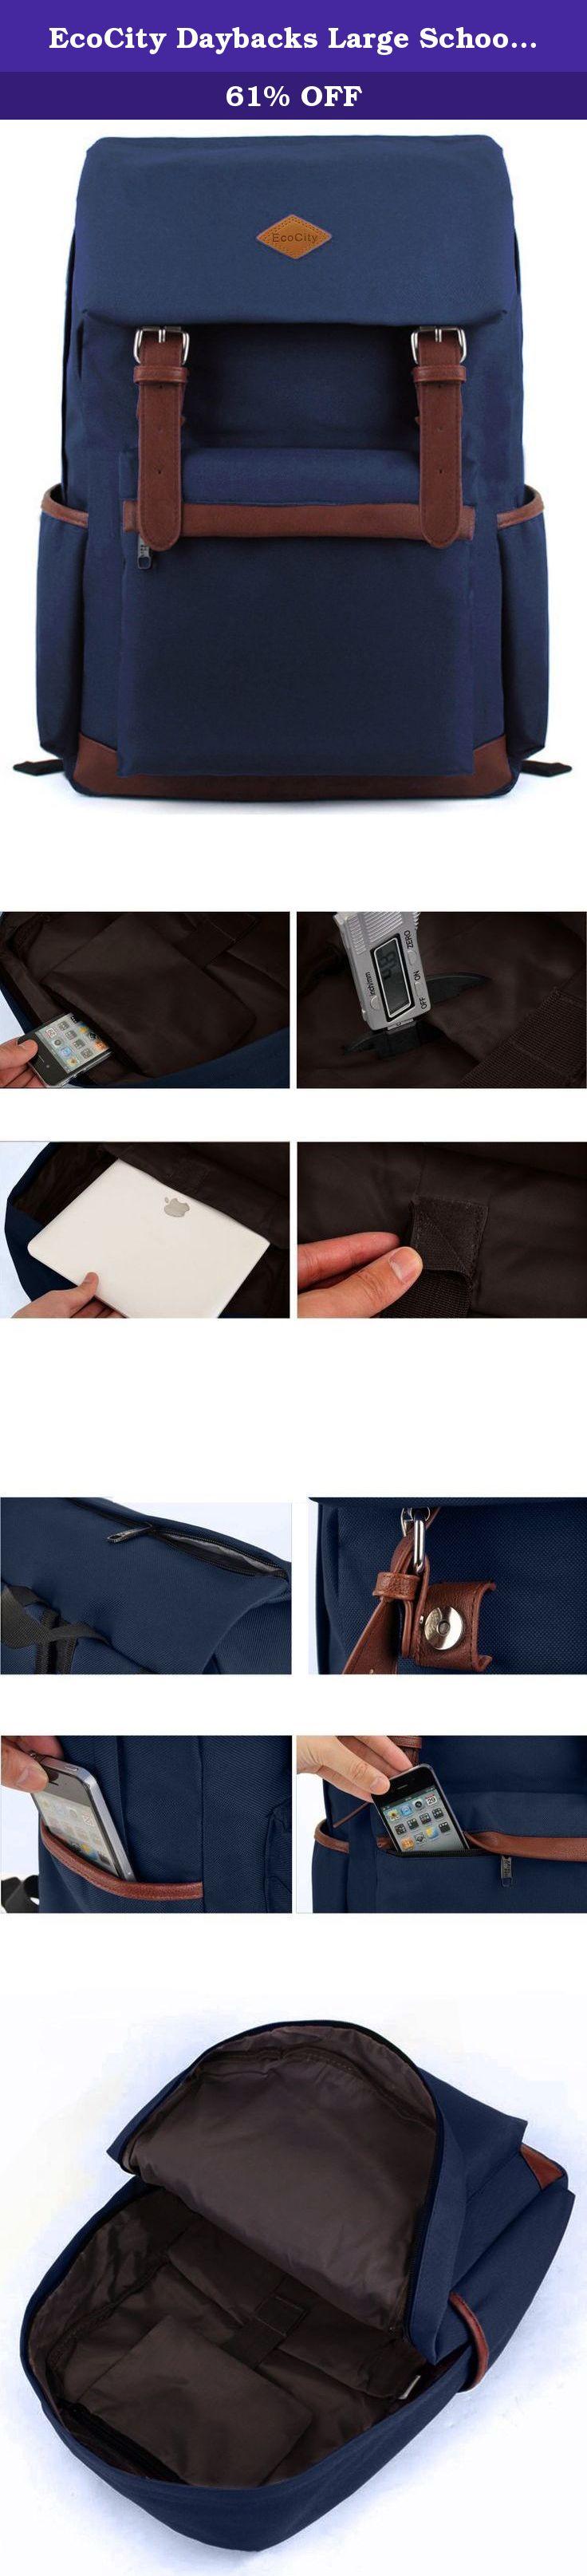 ecocity daybacks large school book bags for men women bp0022n1n